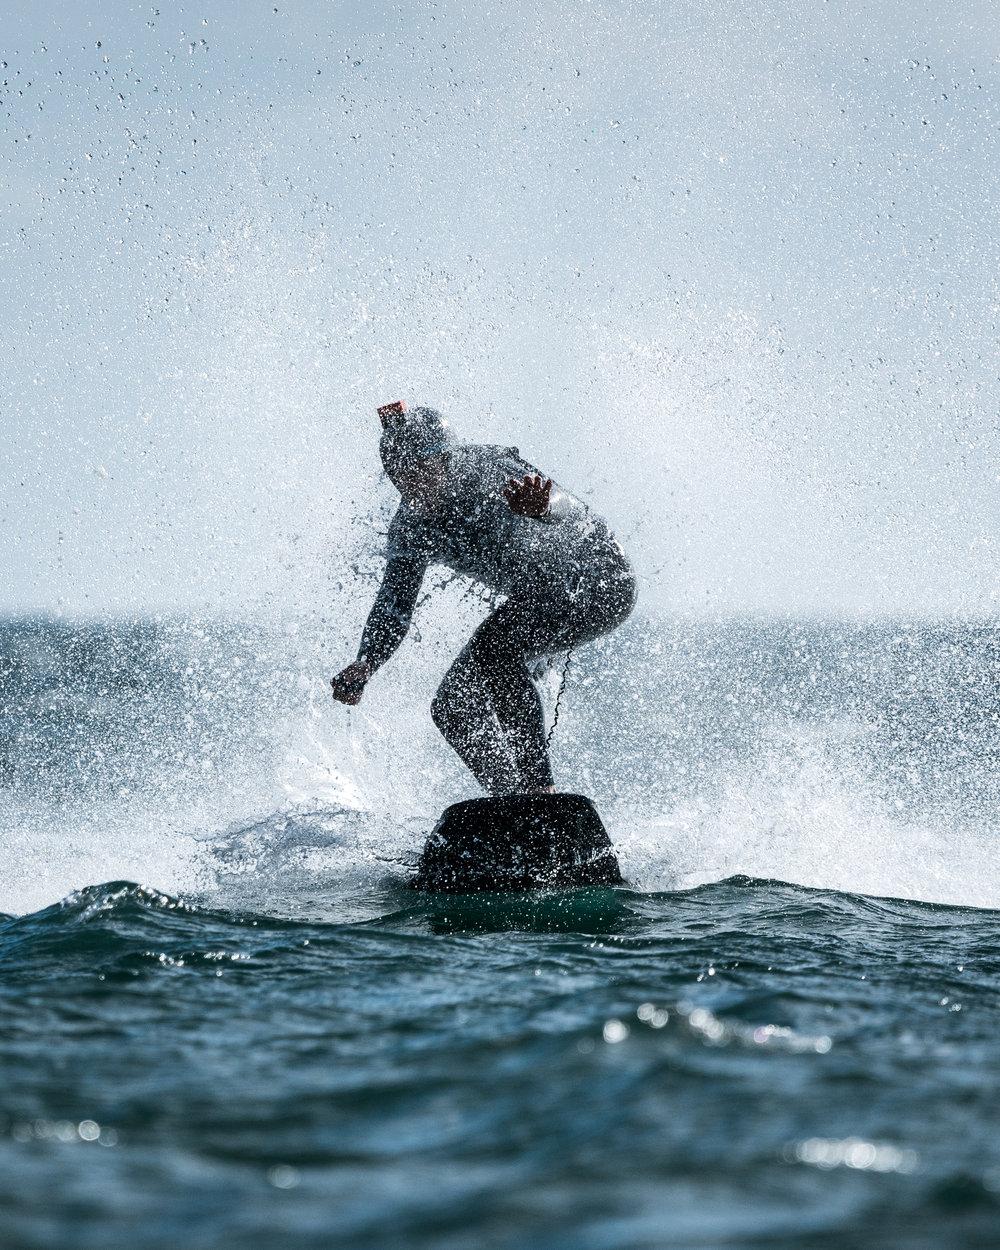 Awake_Ravik_electricsurfboard_jetboard_dunedupilat8.jpg